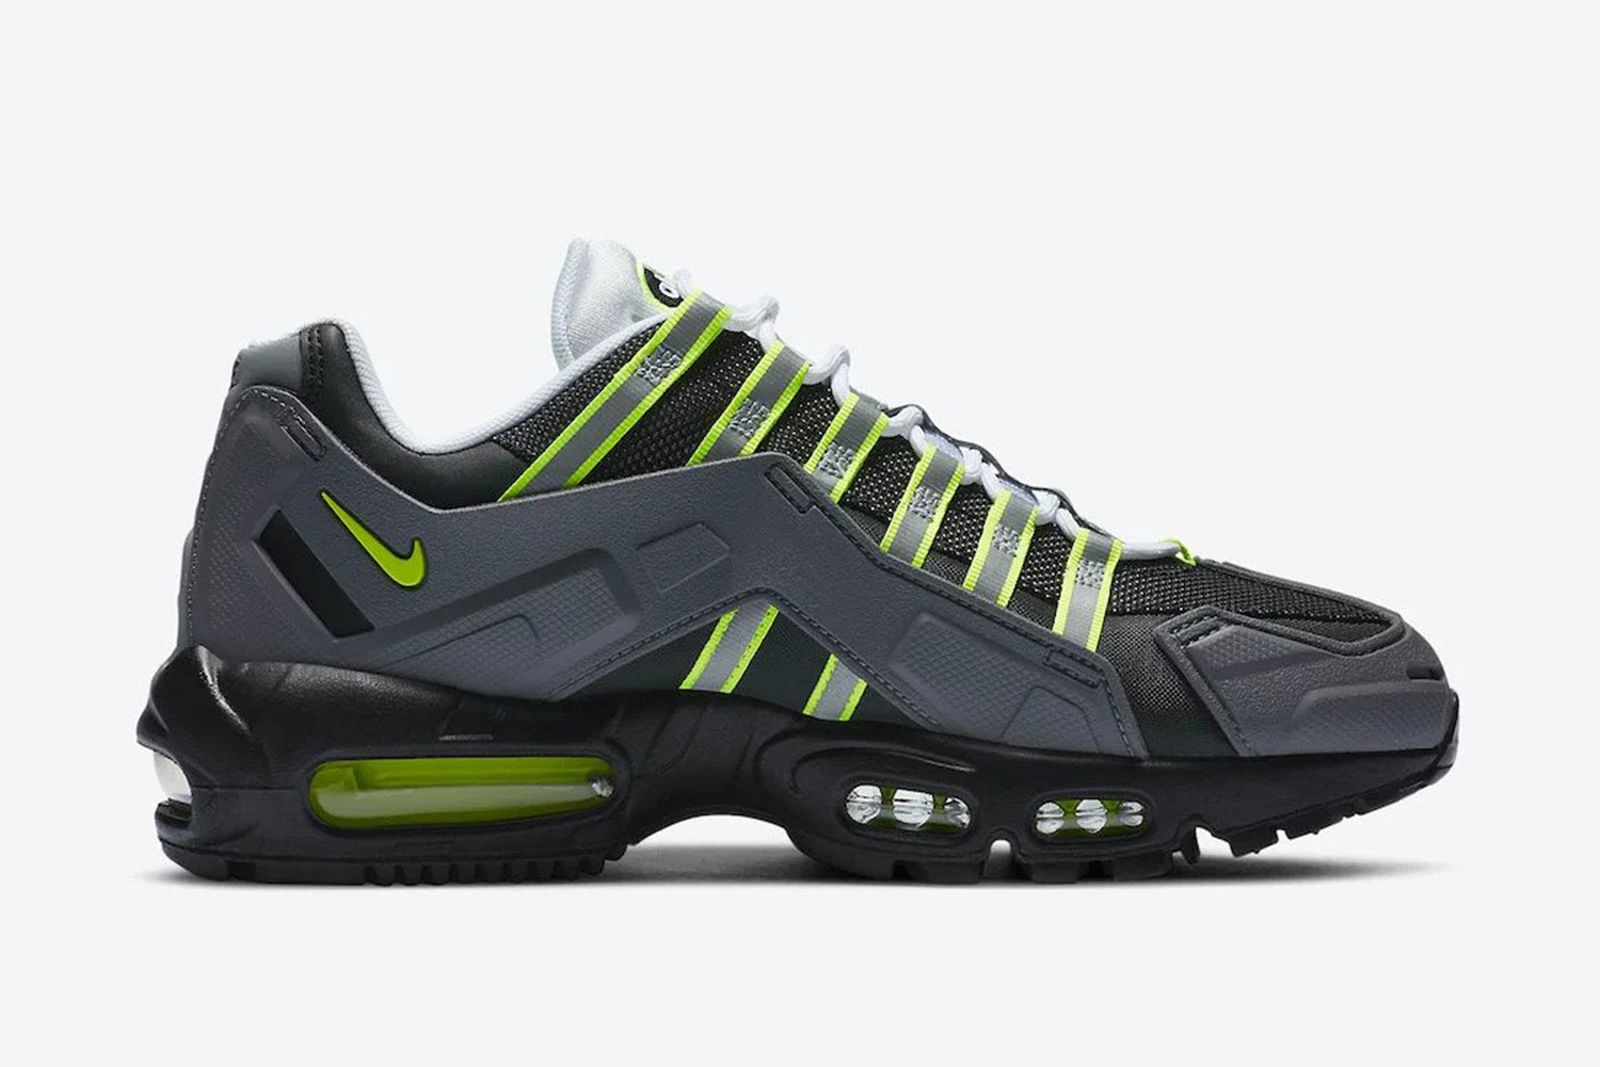 nike-air-max-95-ndstrkt-neon-release-date-price-04